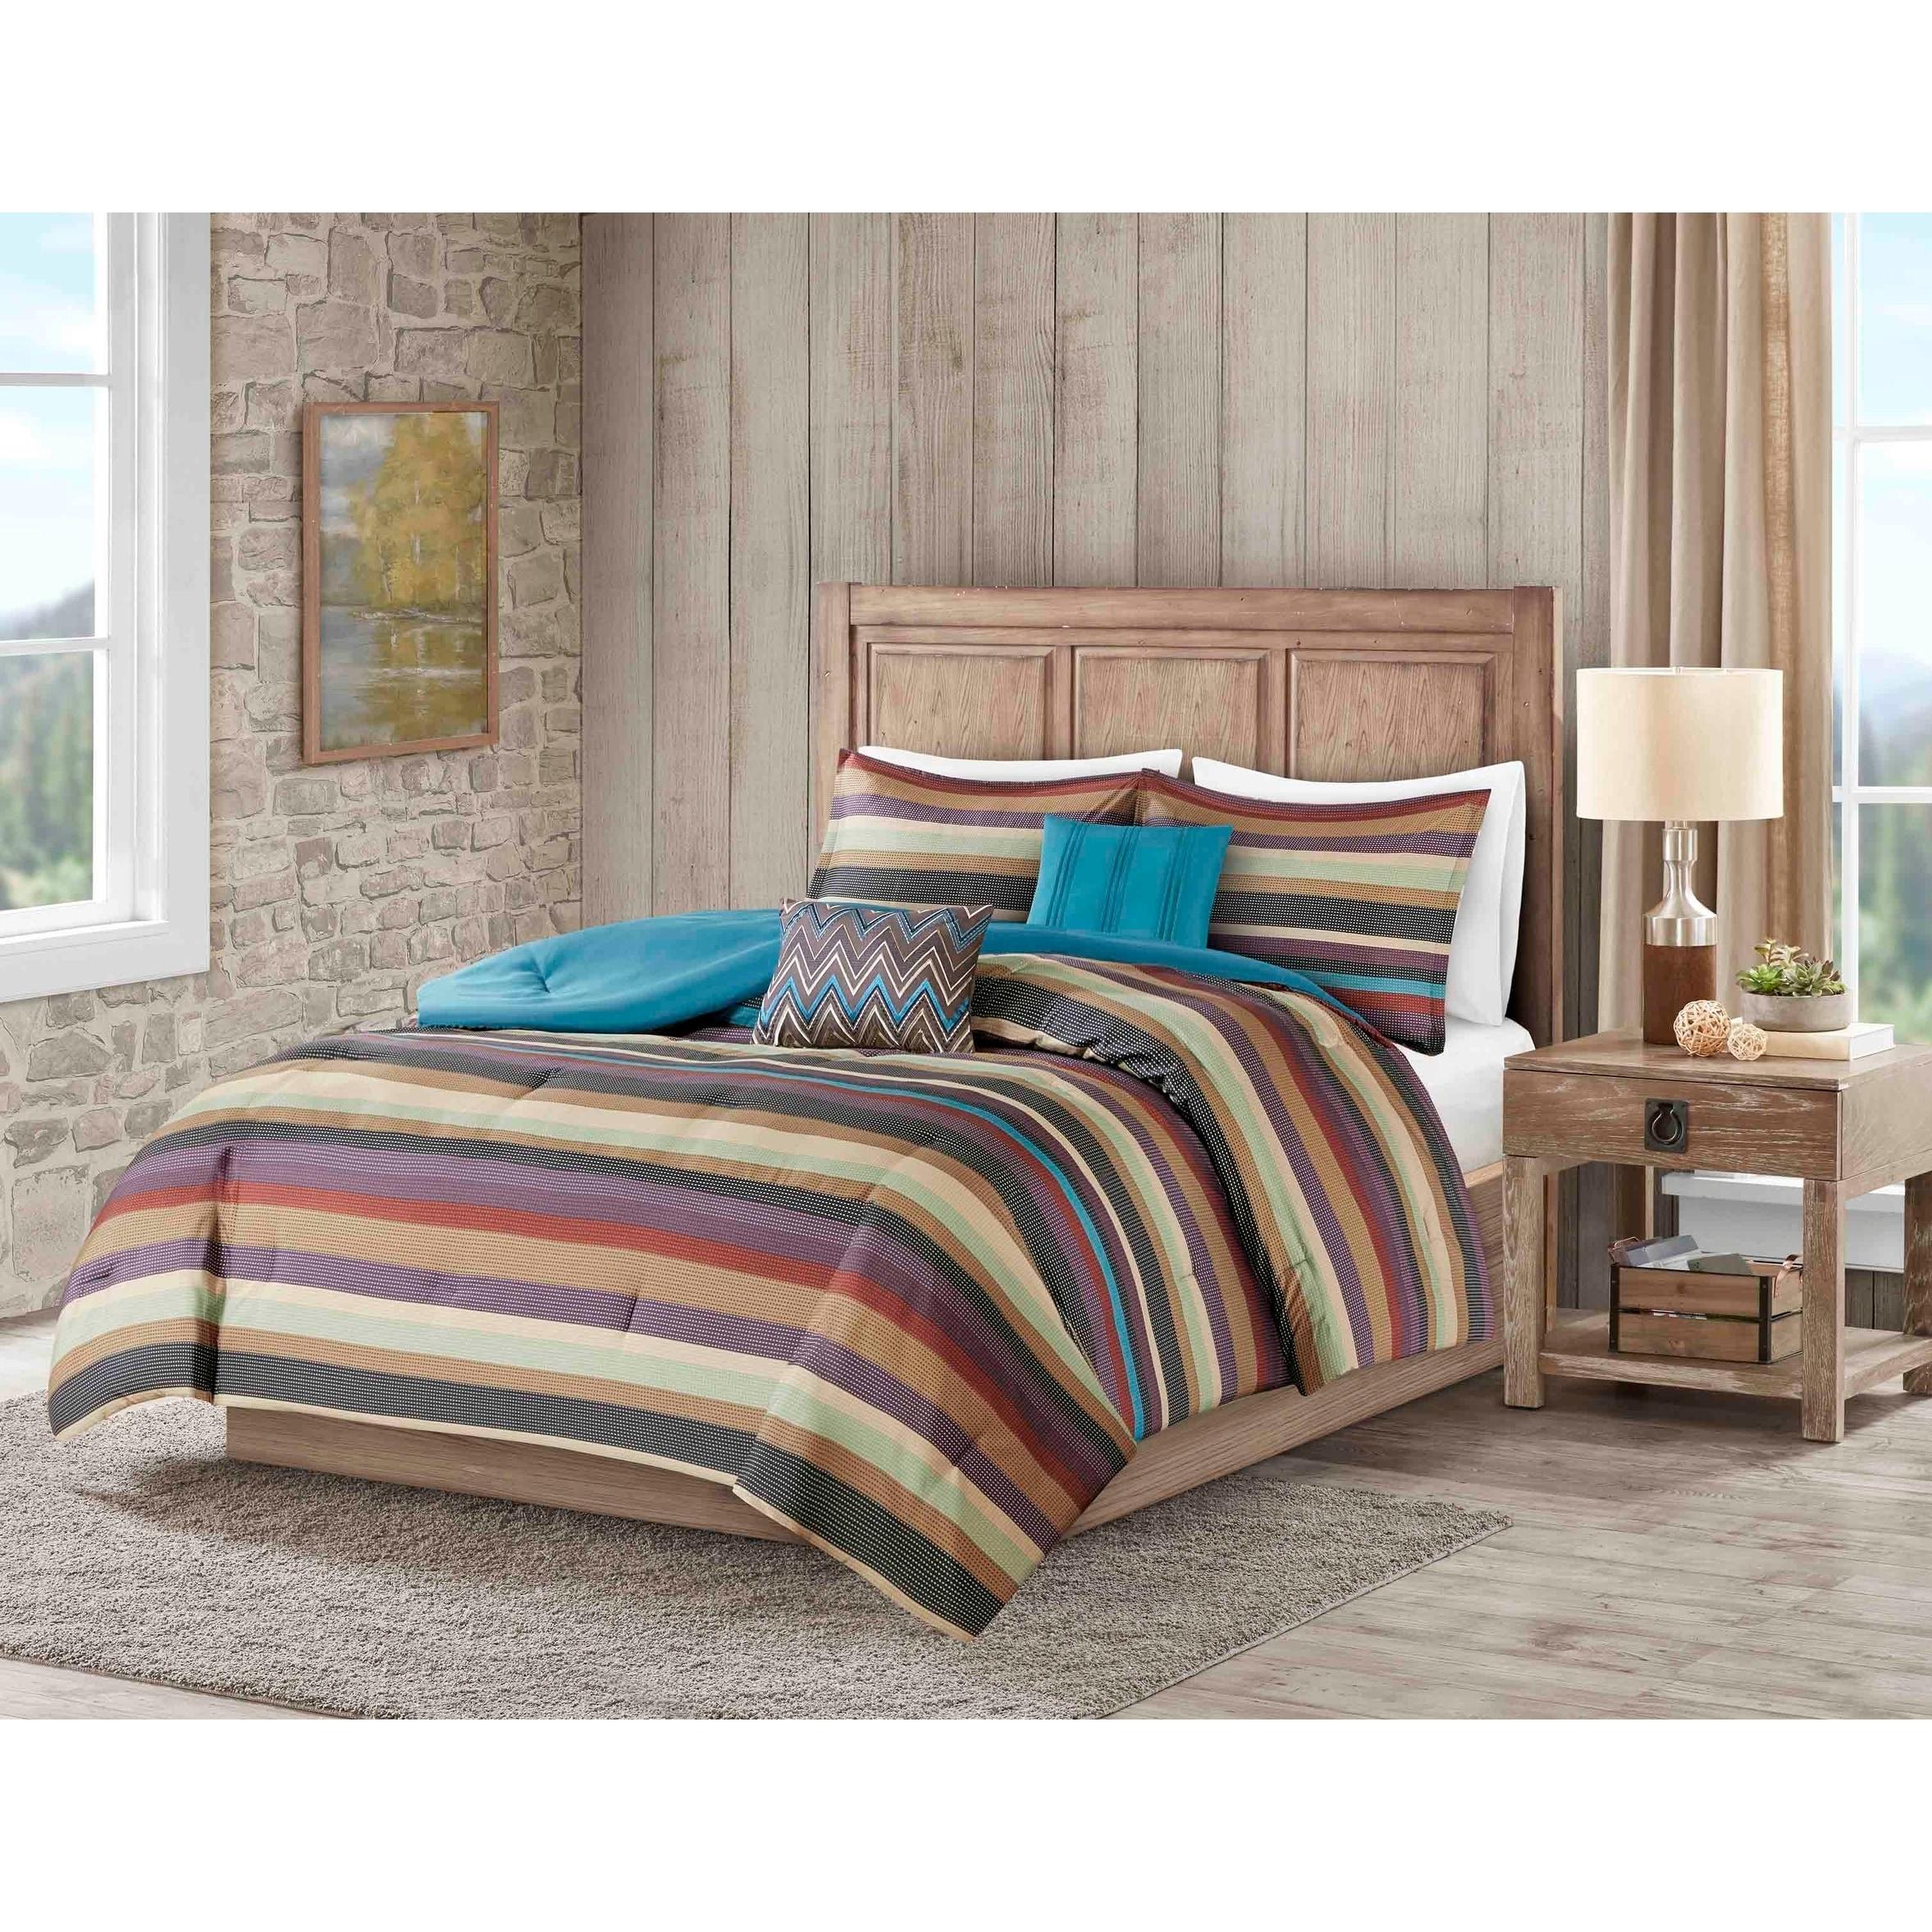 Carbon Loft 5 Piece Striped Bohemian Comforter Set On Sale Overstock 28384748 King